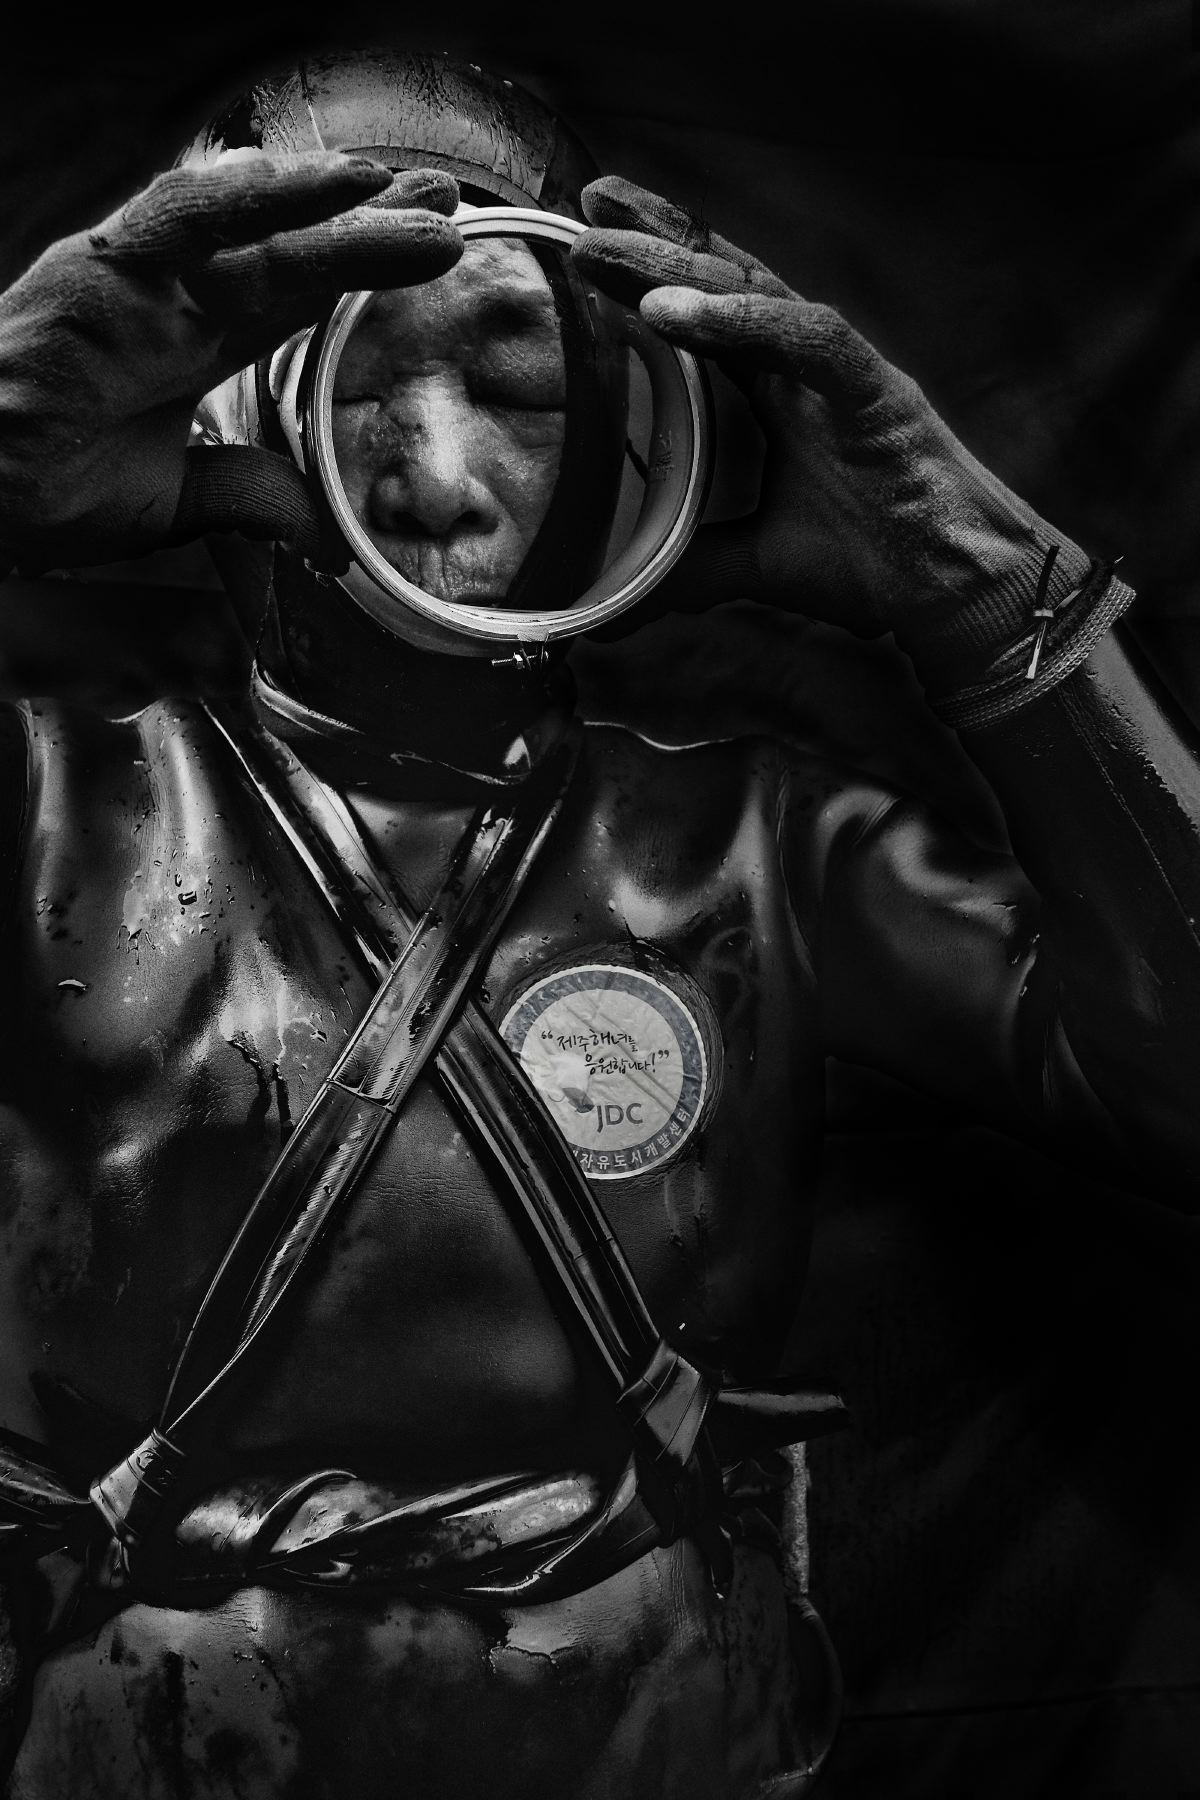 Alain_Schroeder_Grandma_Divers_03.JPG